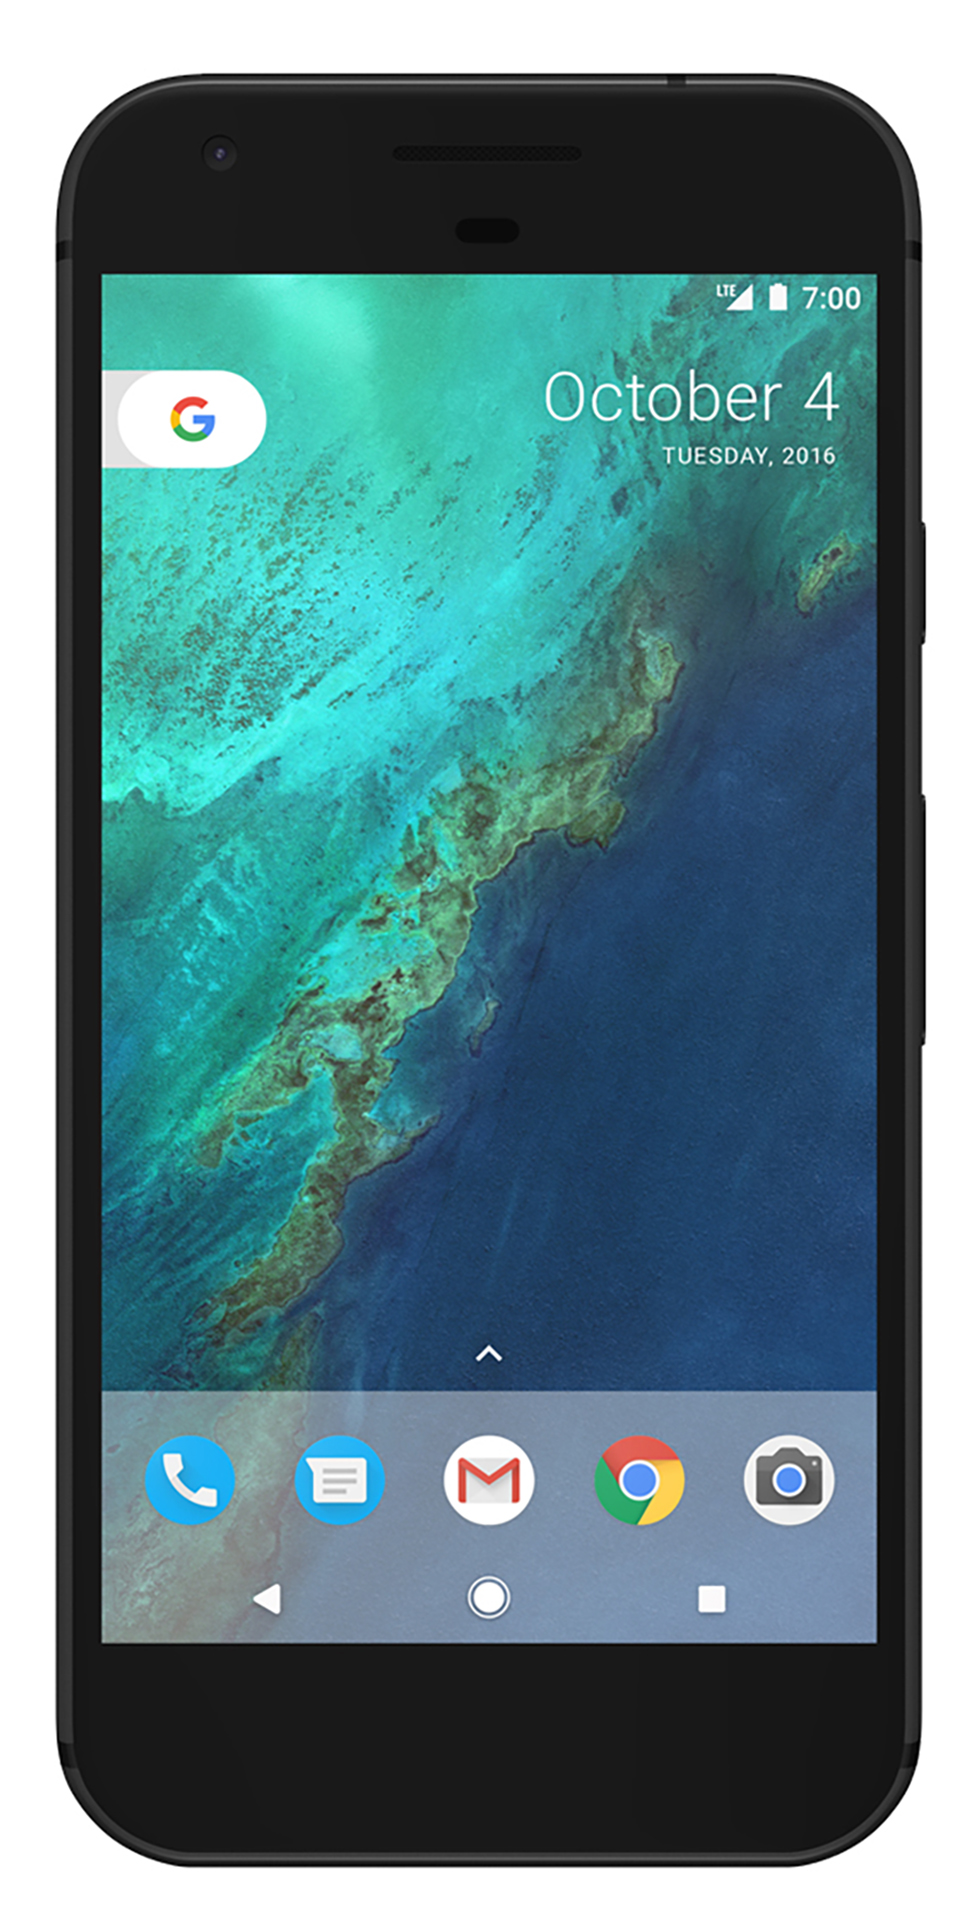 Google Pixel XL 128GB Unlocked GSM Phone w/ 12.3MP Camera - Quite...